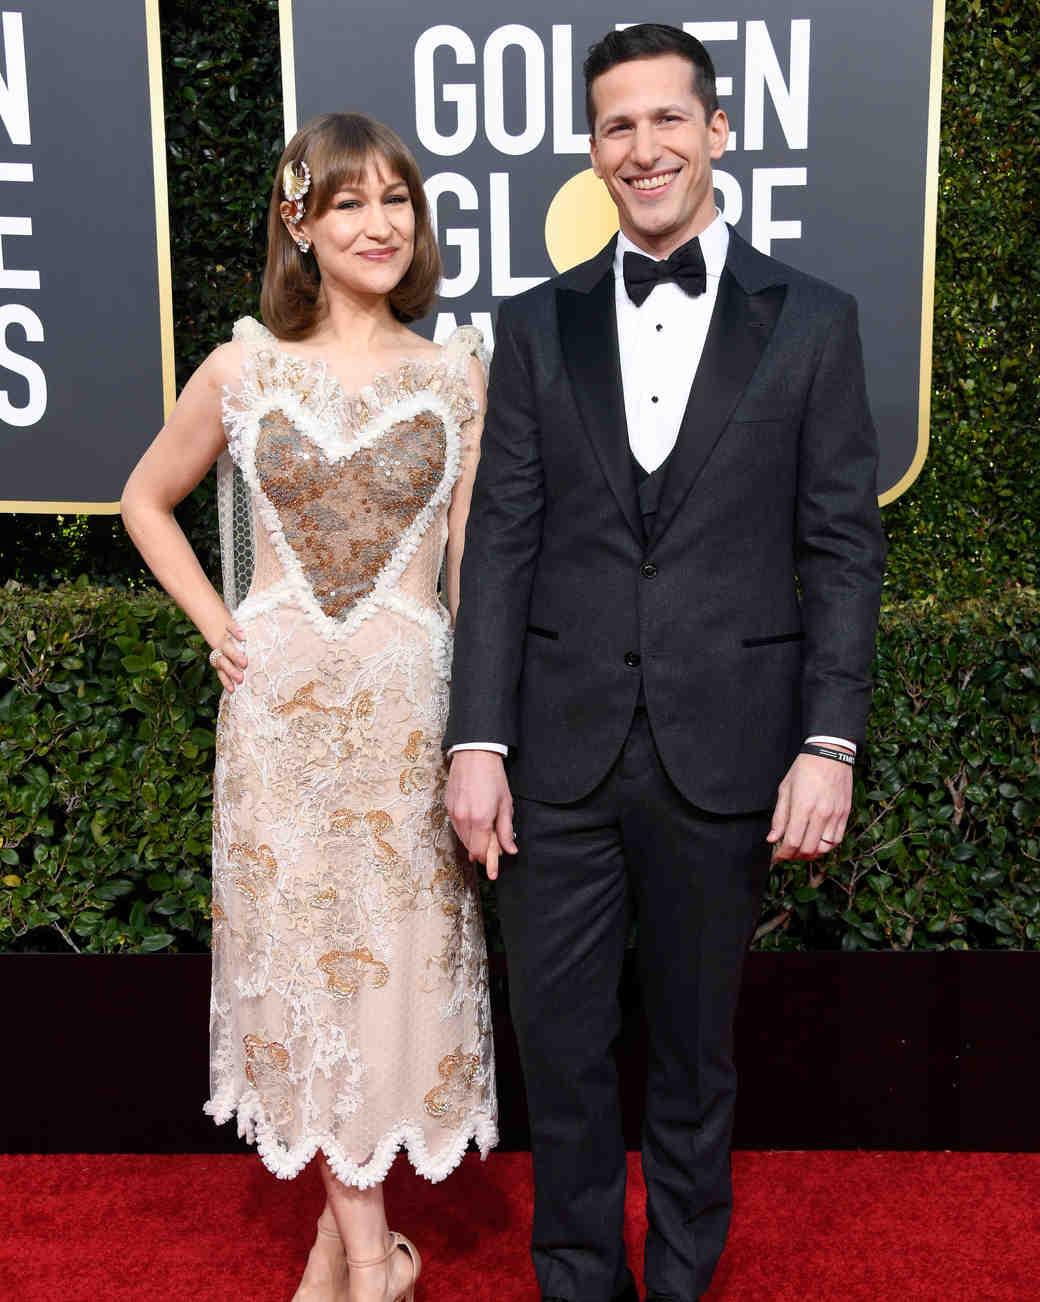 Couples Golden Globes 2019 Red Carpet Martha Stewart Weddings